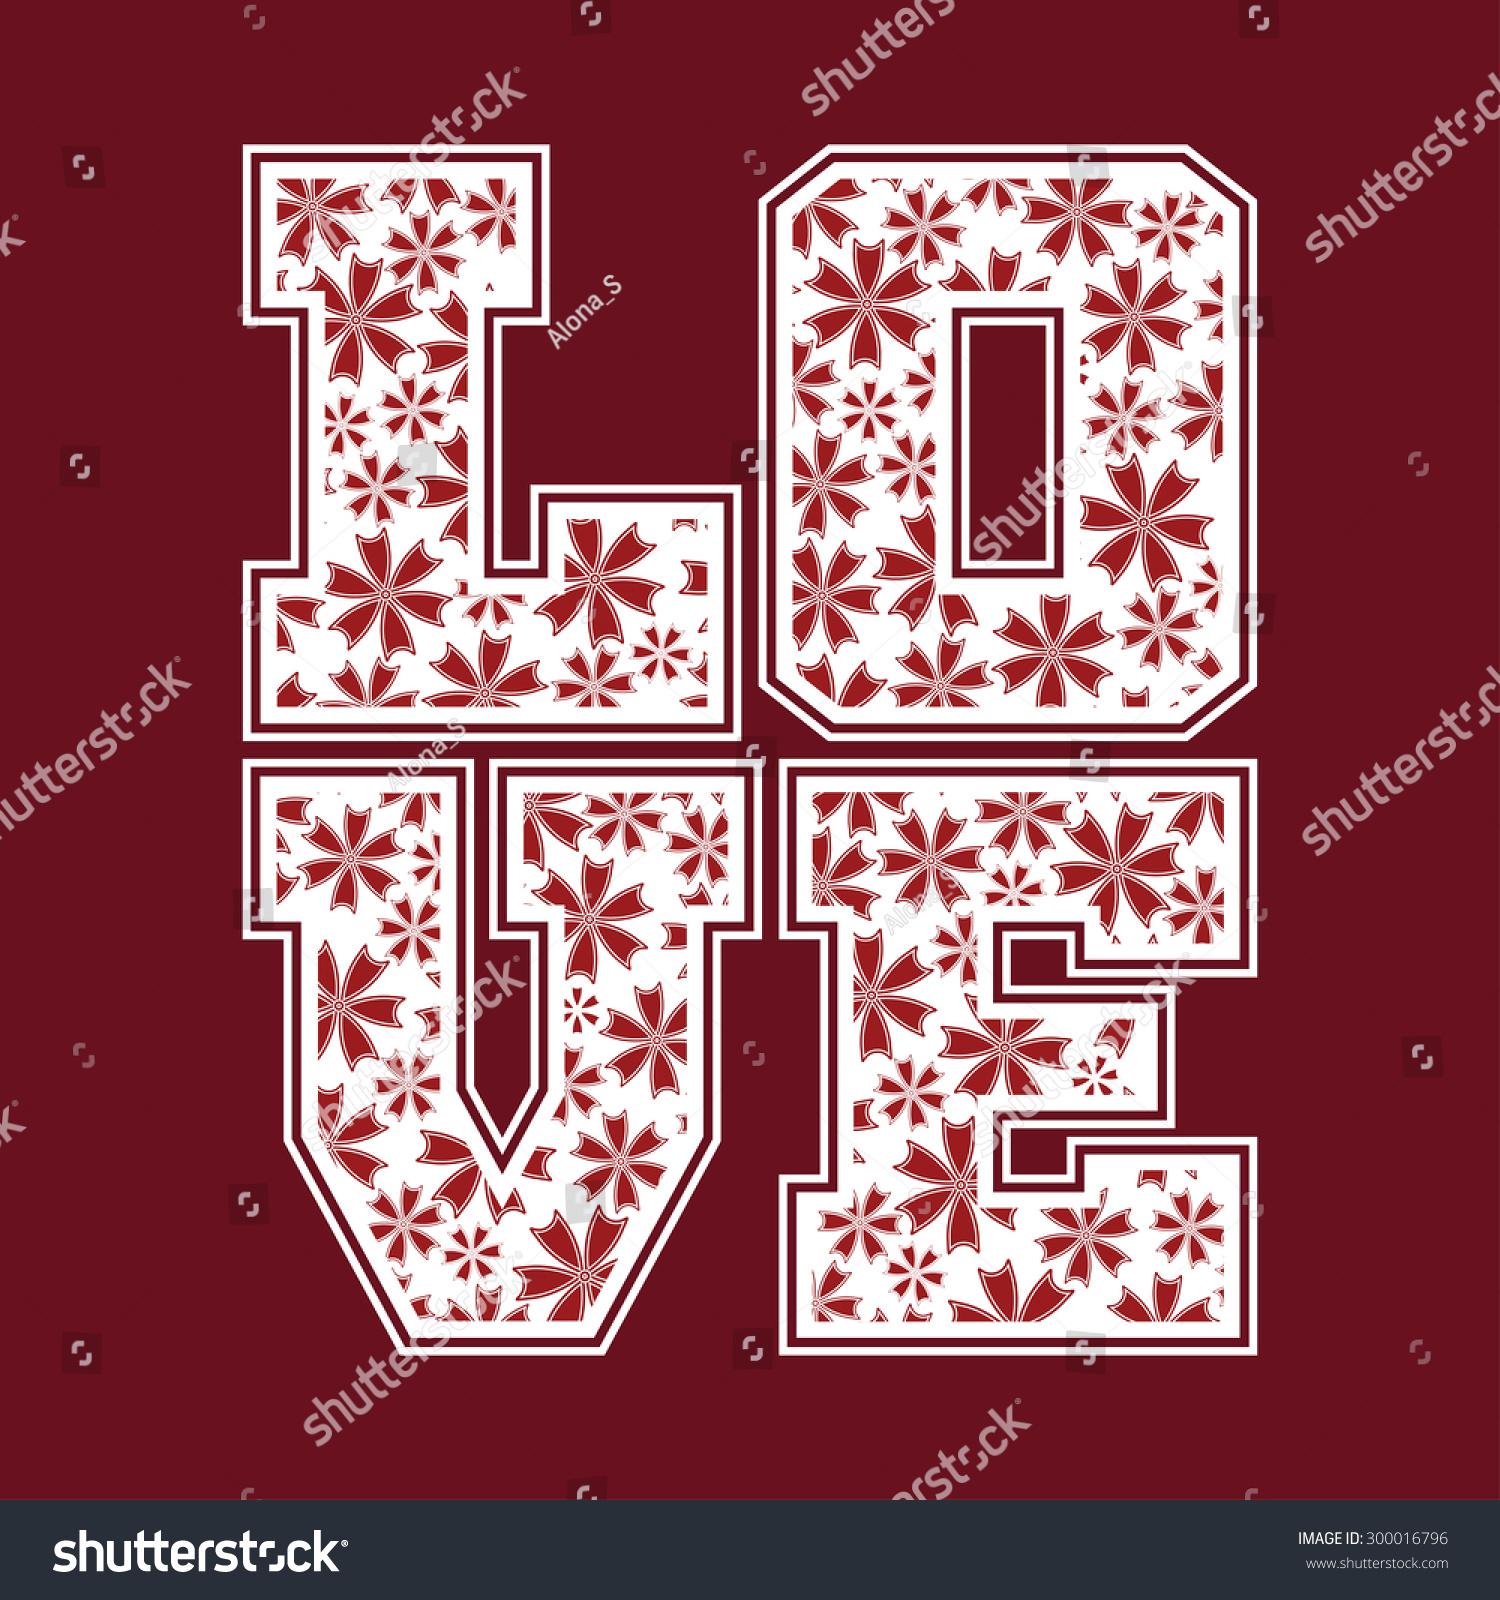 Shirt design card - Love Print Floral Letters Design Card Typography Decorative Emblem Women T